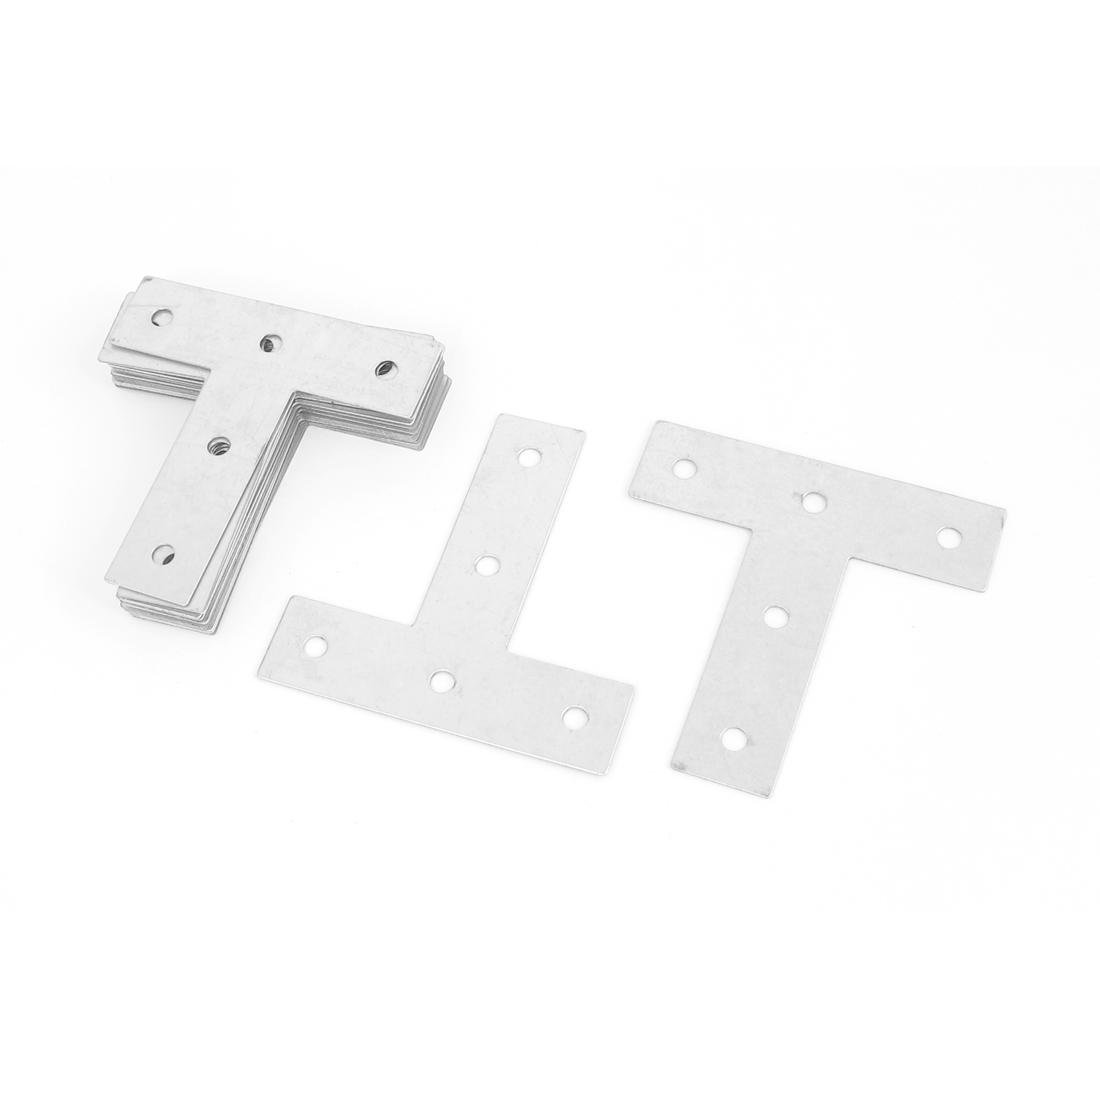 75mmx75mm Angle Plate Corner Brace Flat T Shape Repair Bracket Silver Tone 20pcs